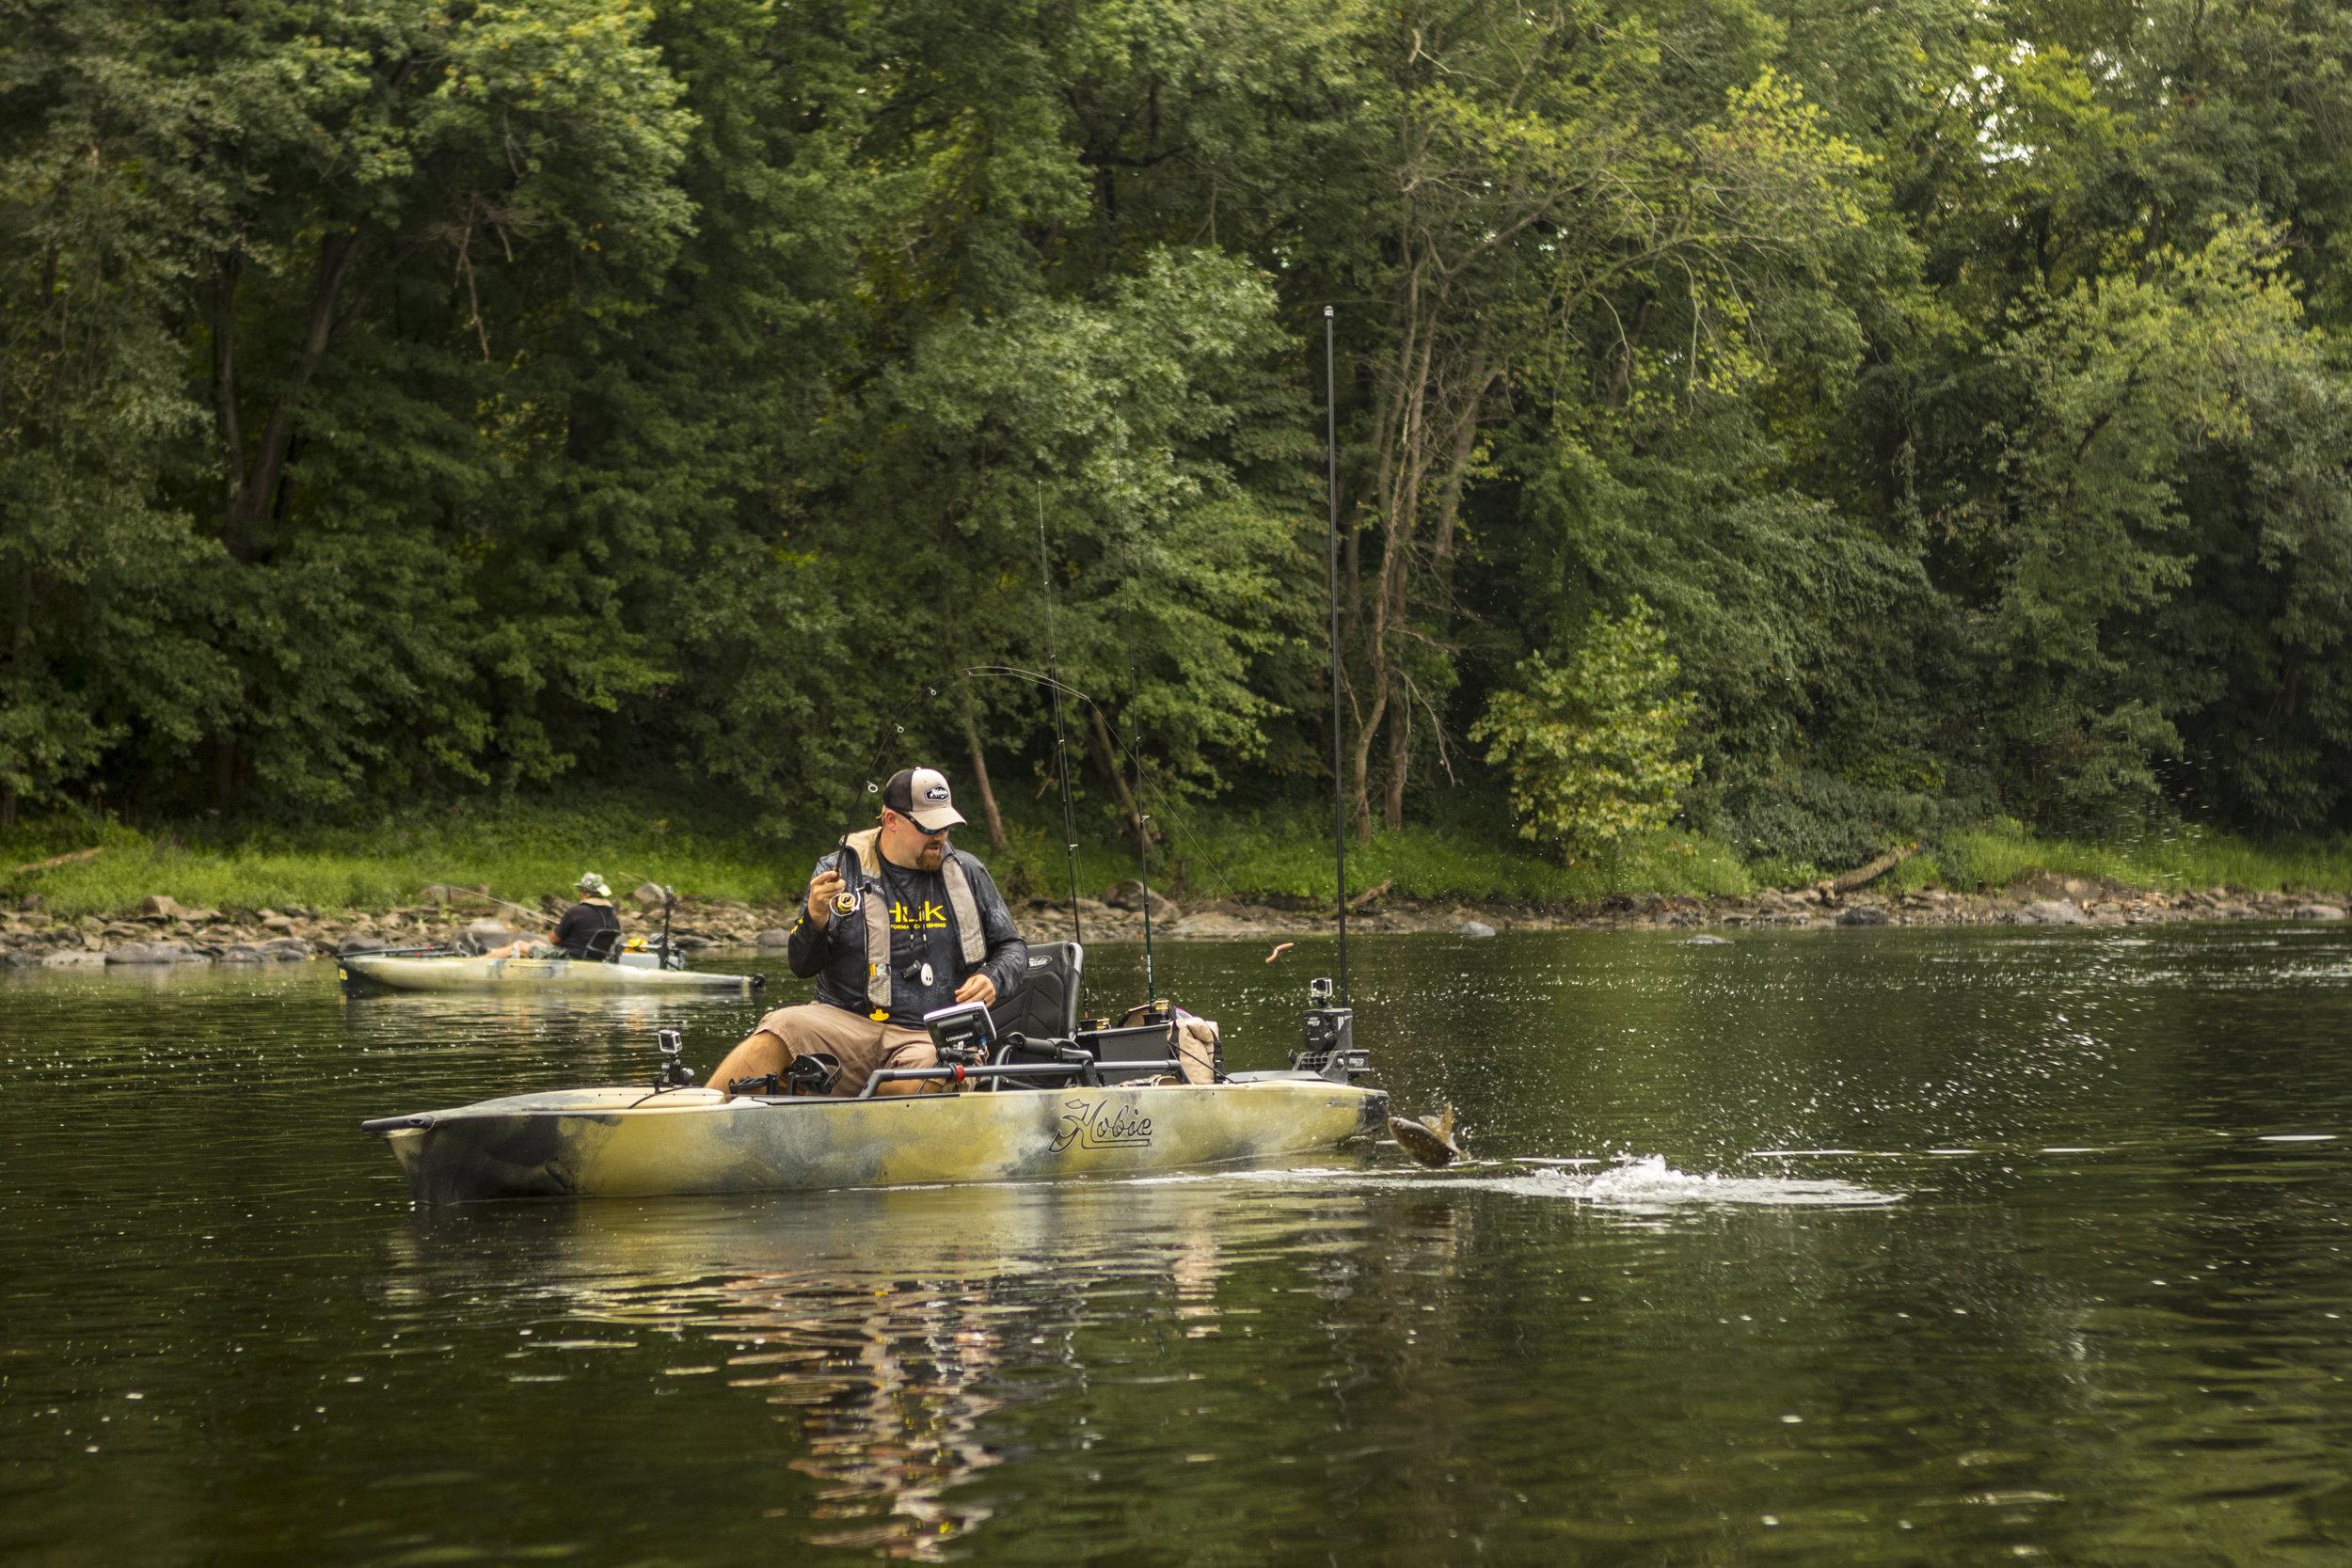 ProAngler14-action-fishing-camo-river-C2-smallmouth-5371-full.jpg